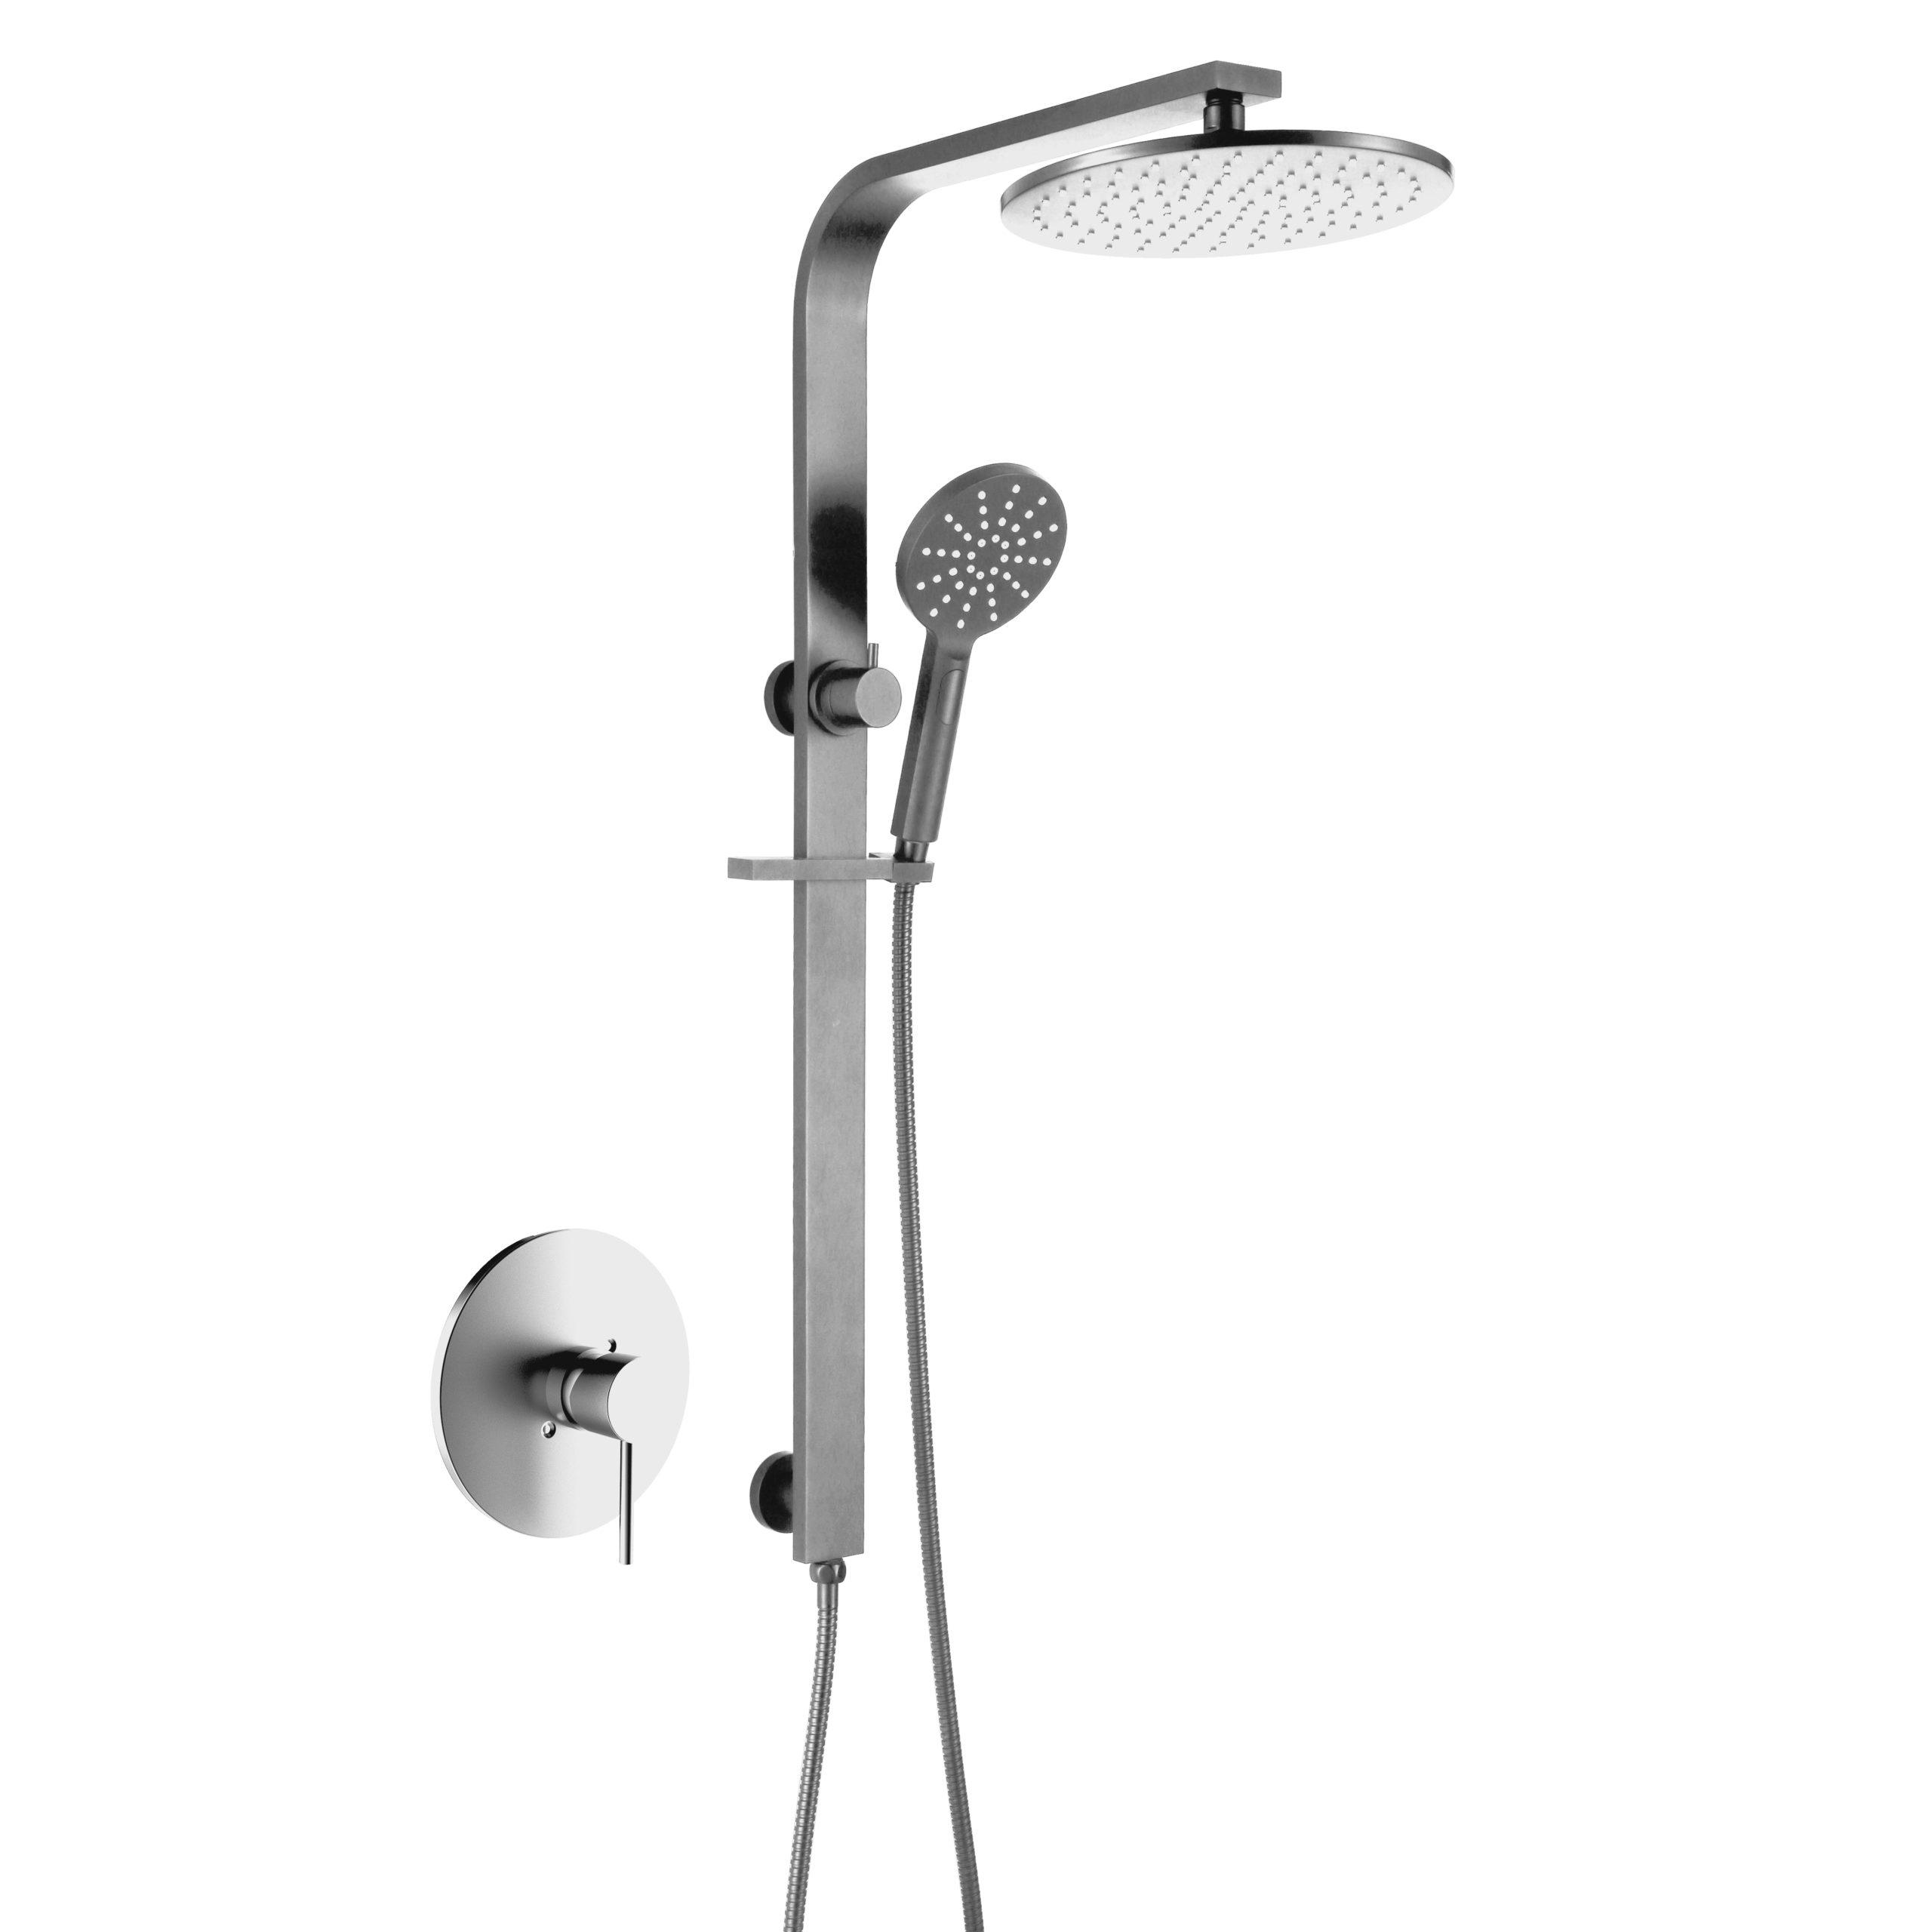 DSF-38BSS01 Shower Set Image